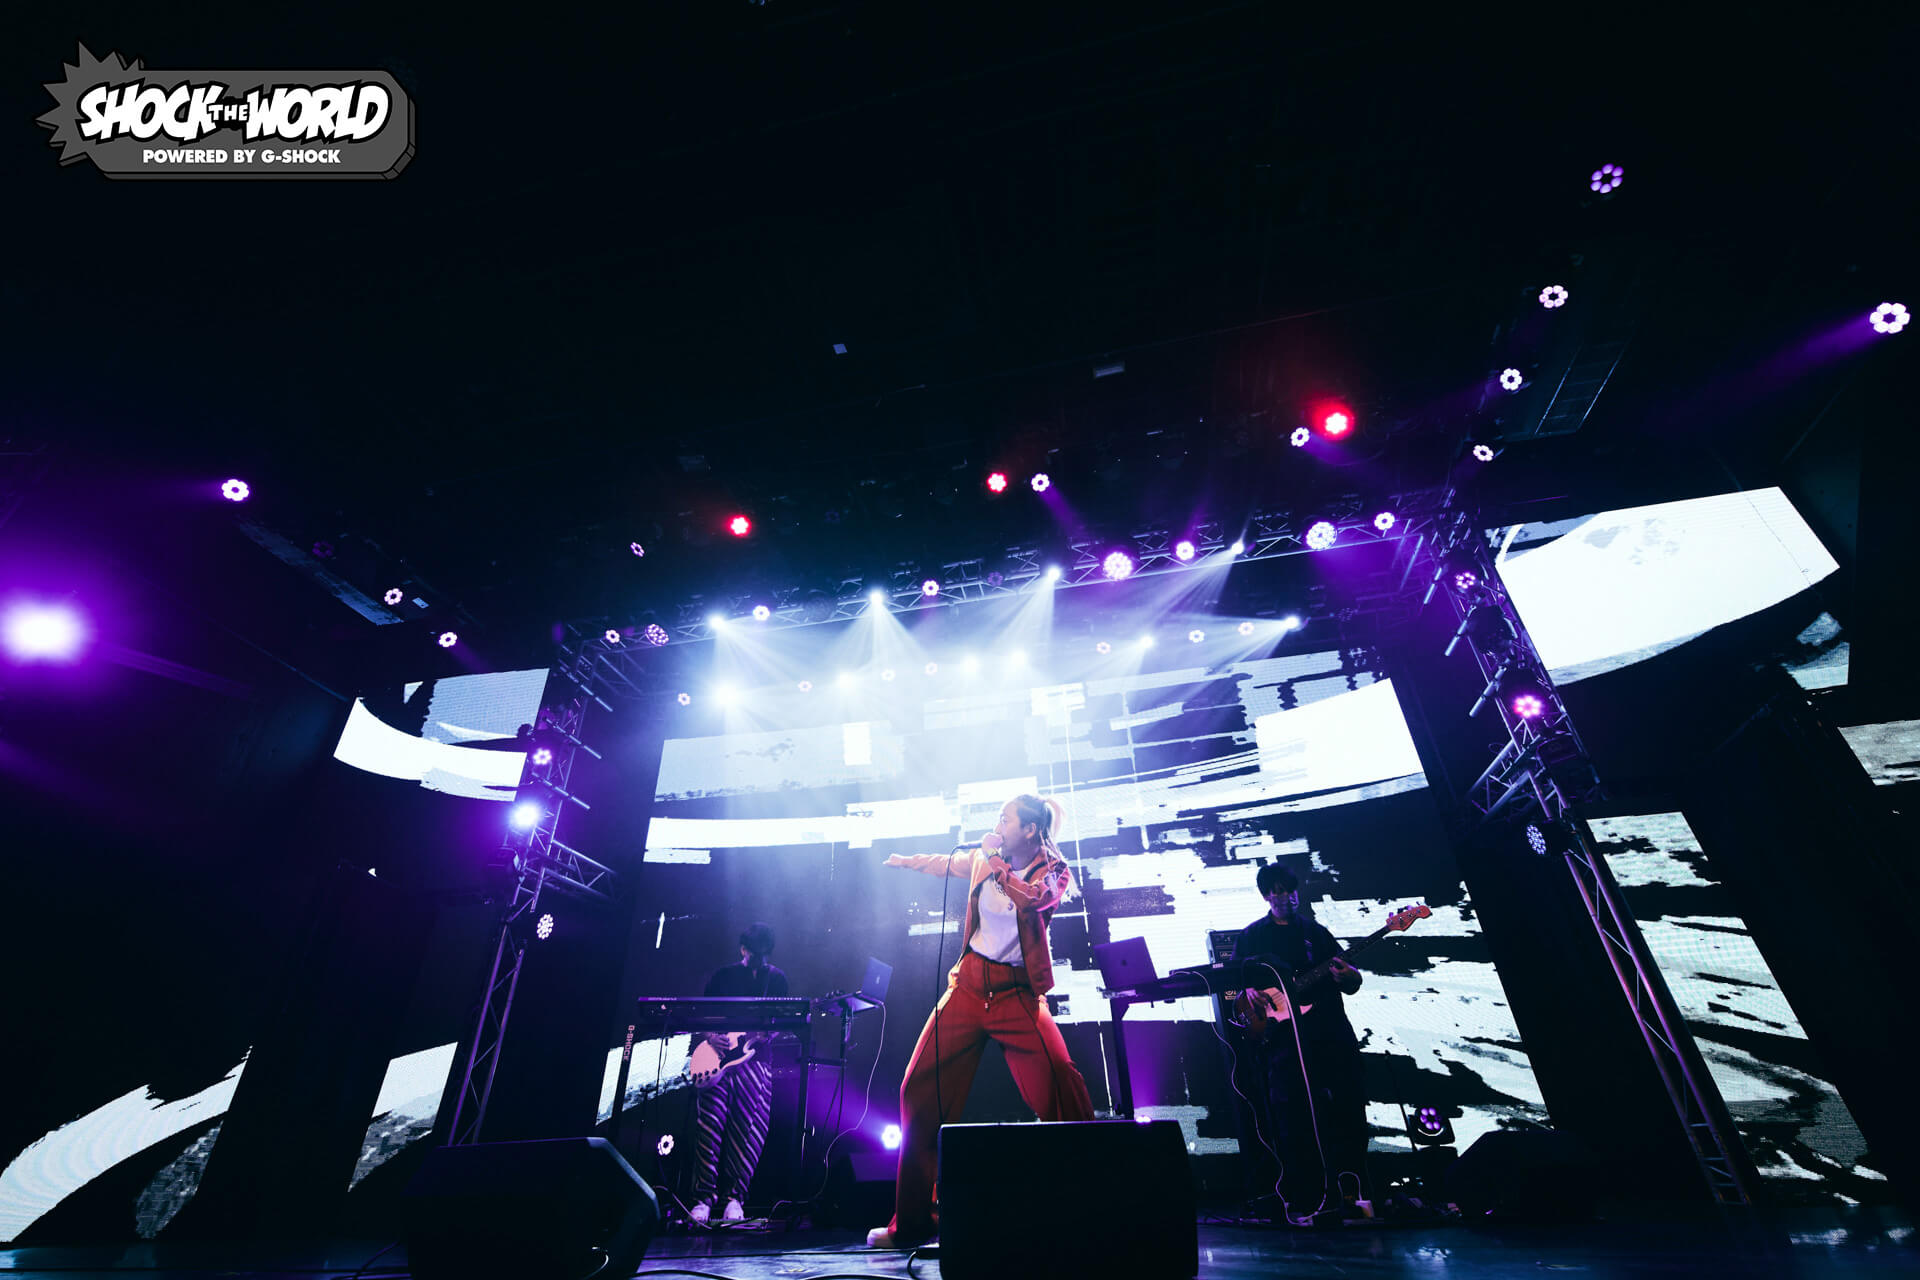 G-SHOCK『SHOCK THE WORLD』第6弾で80KIDZ、あっこゴリラ、YonYonのトーク&ライブセッションが実現! music210804_shocktheworld_4